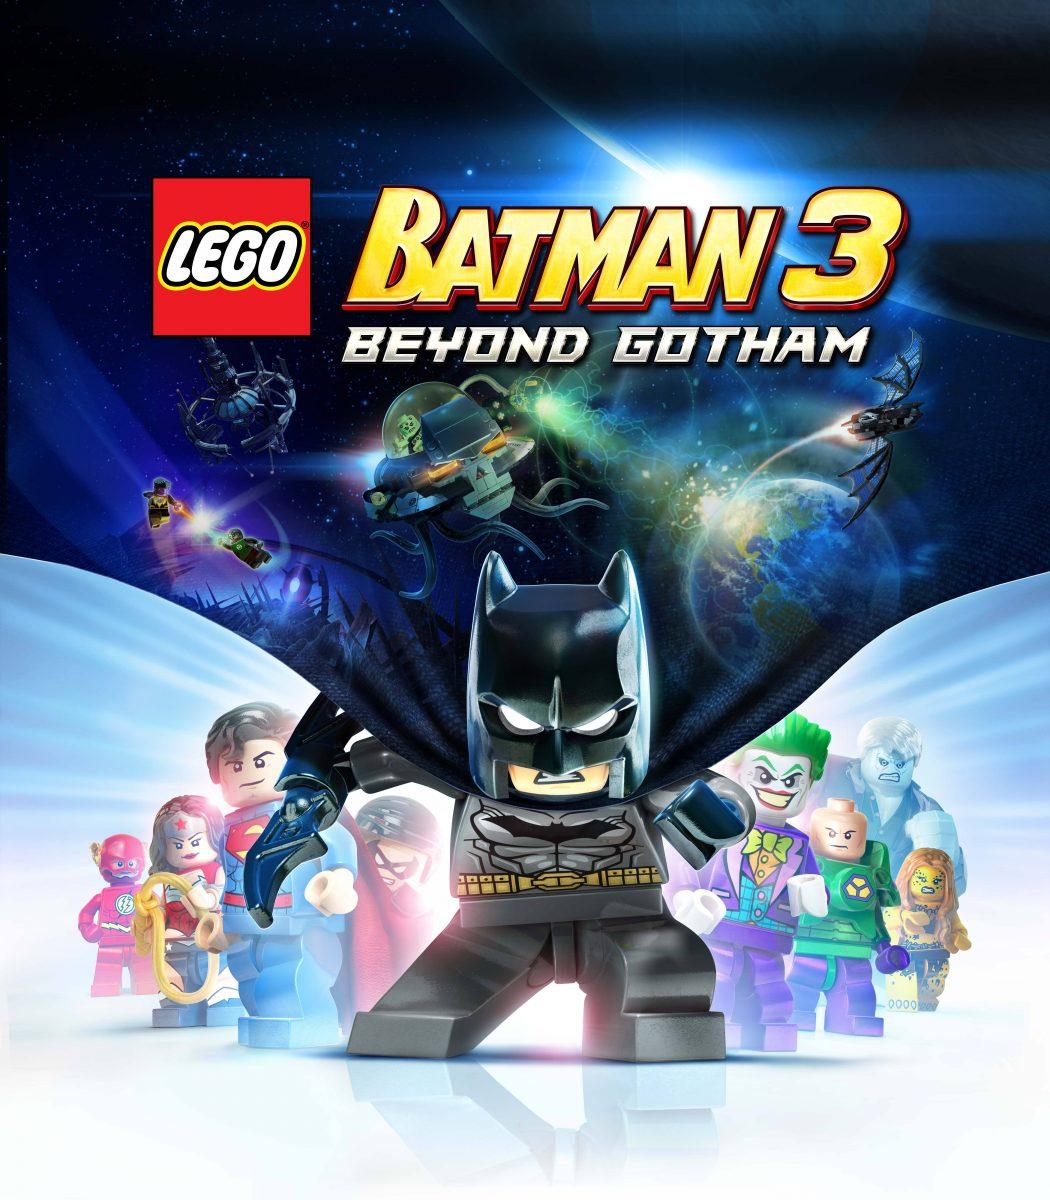 Lego-Batman-3-Box-Art 11 Tips on Mixing Antique and Modern Décor Styles